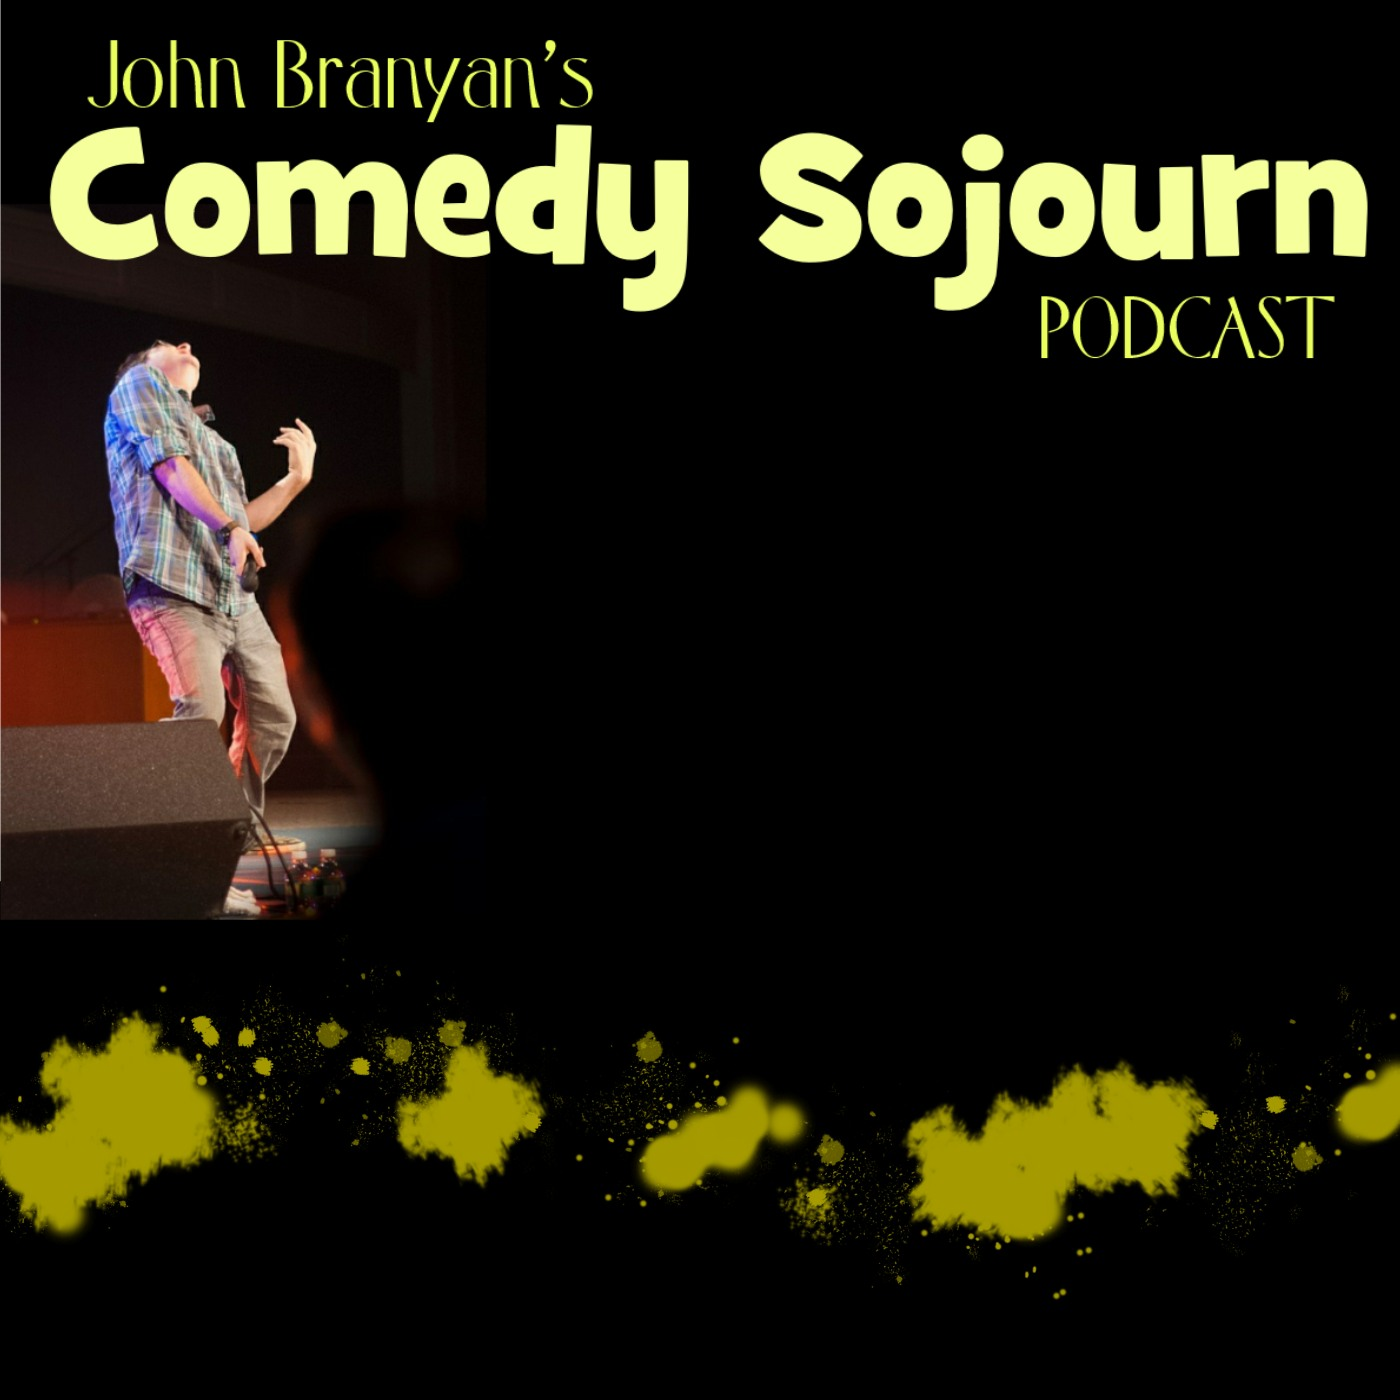 John Branyan's Comedy Sojourn Podcast logo